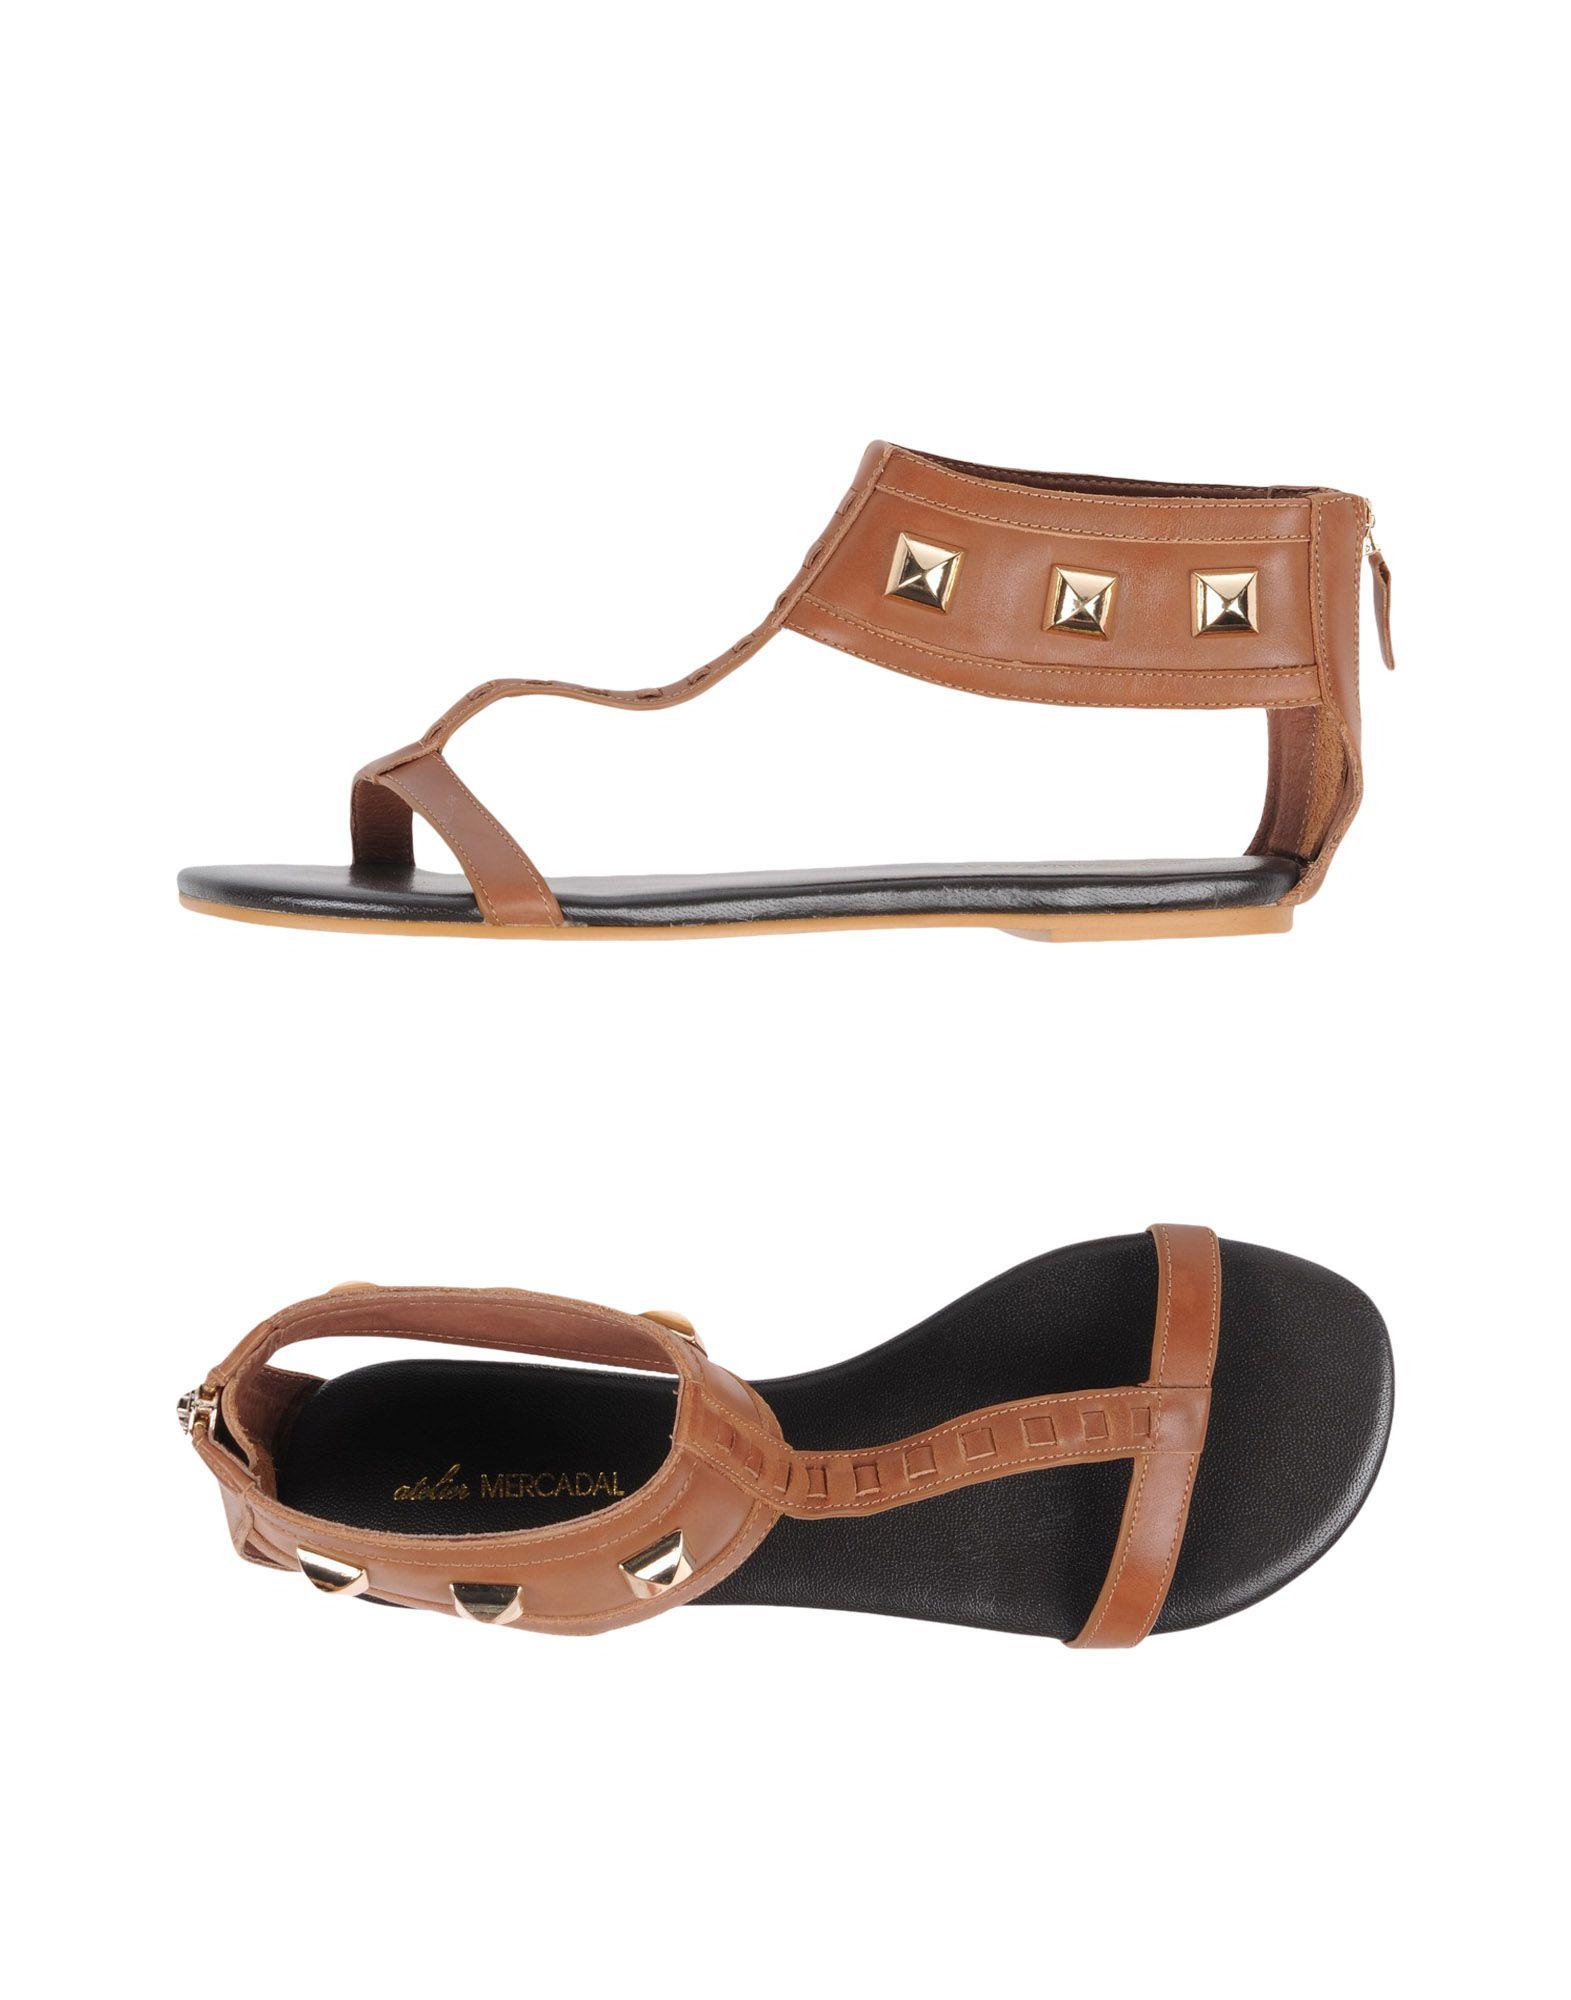 ATELIER MERCADAL Sandals in Camel